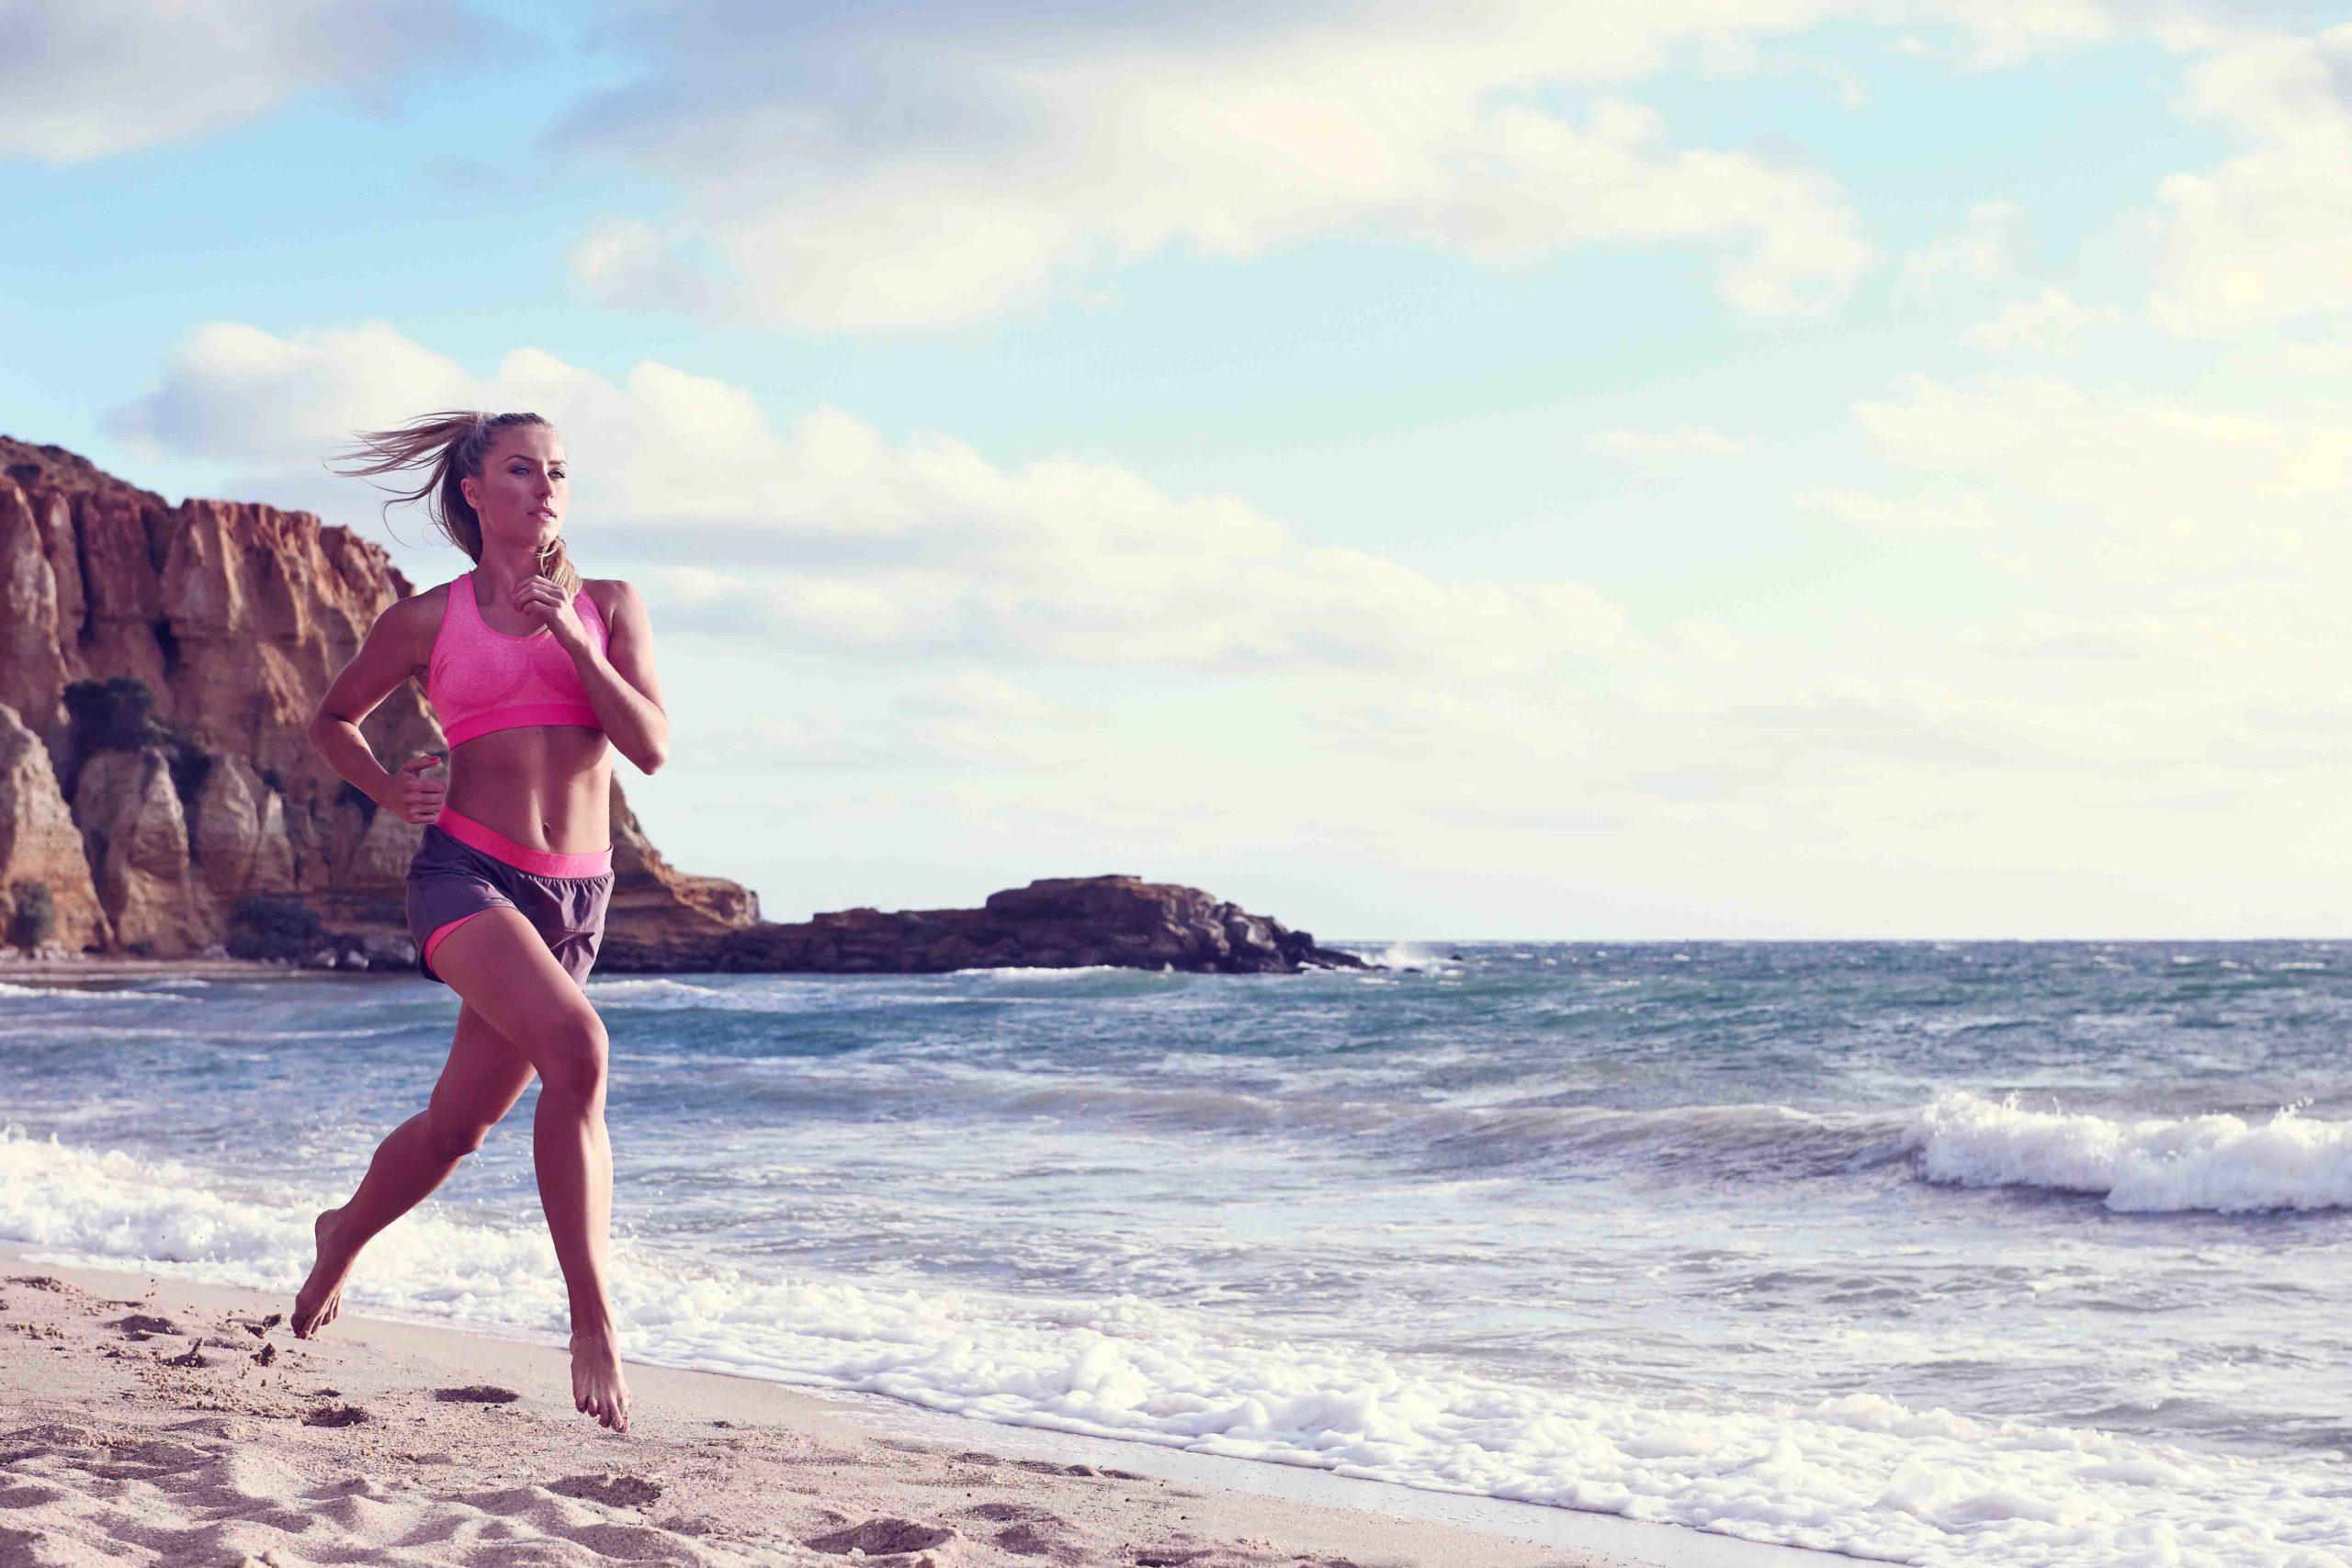 Justyna running along beach